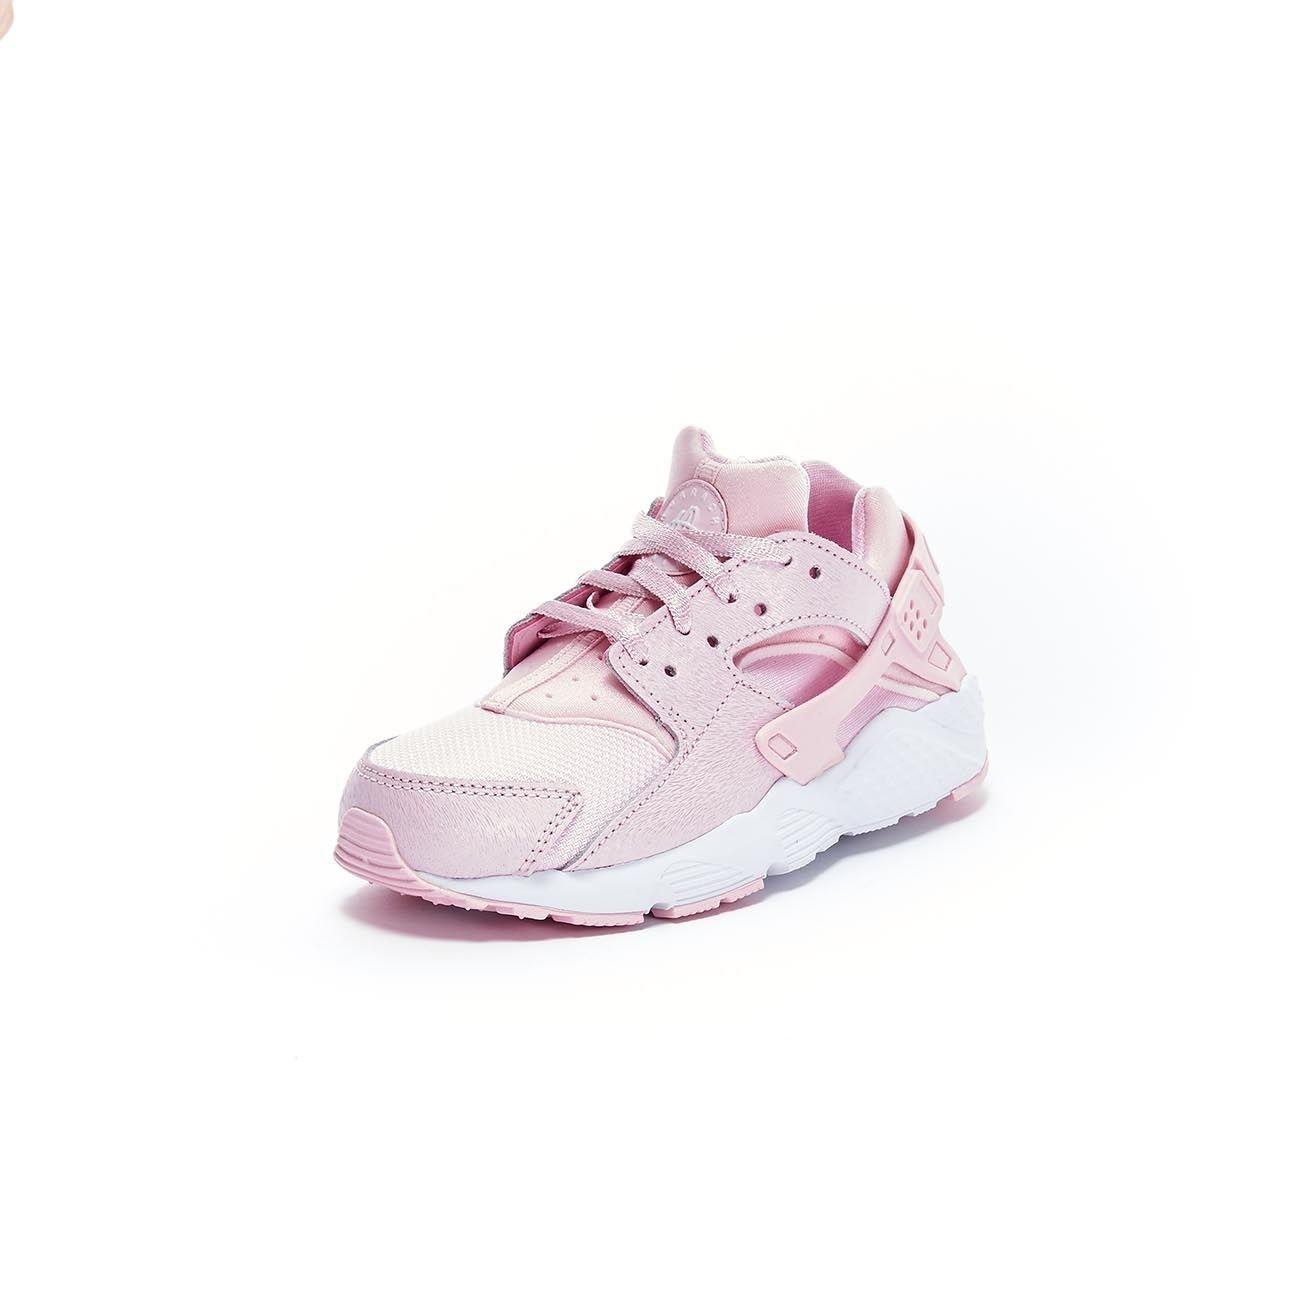 NIKE HUARACHE RUN SE SNEAKERS Kid Pink   Mascheroni Sportswear